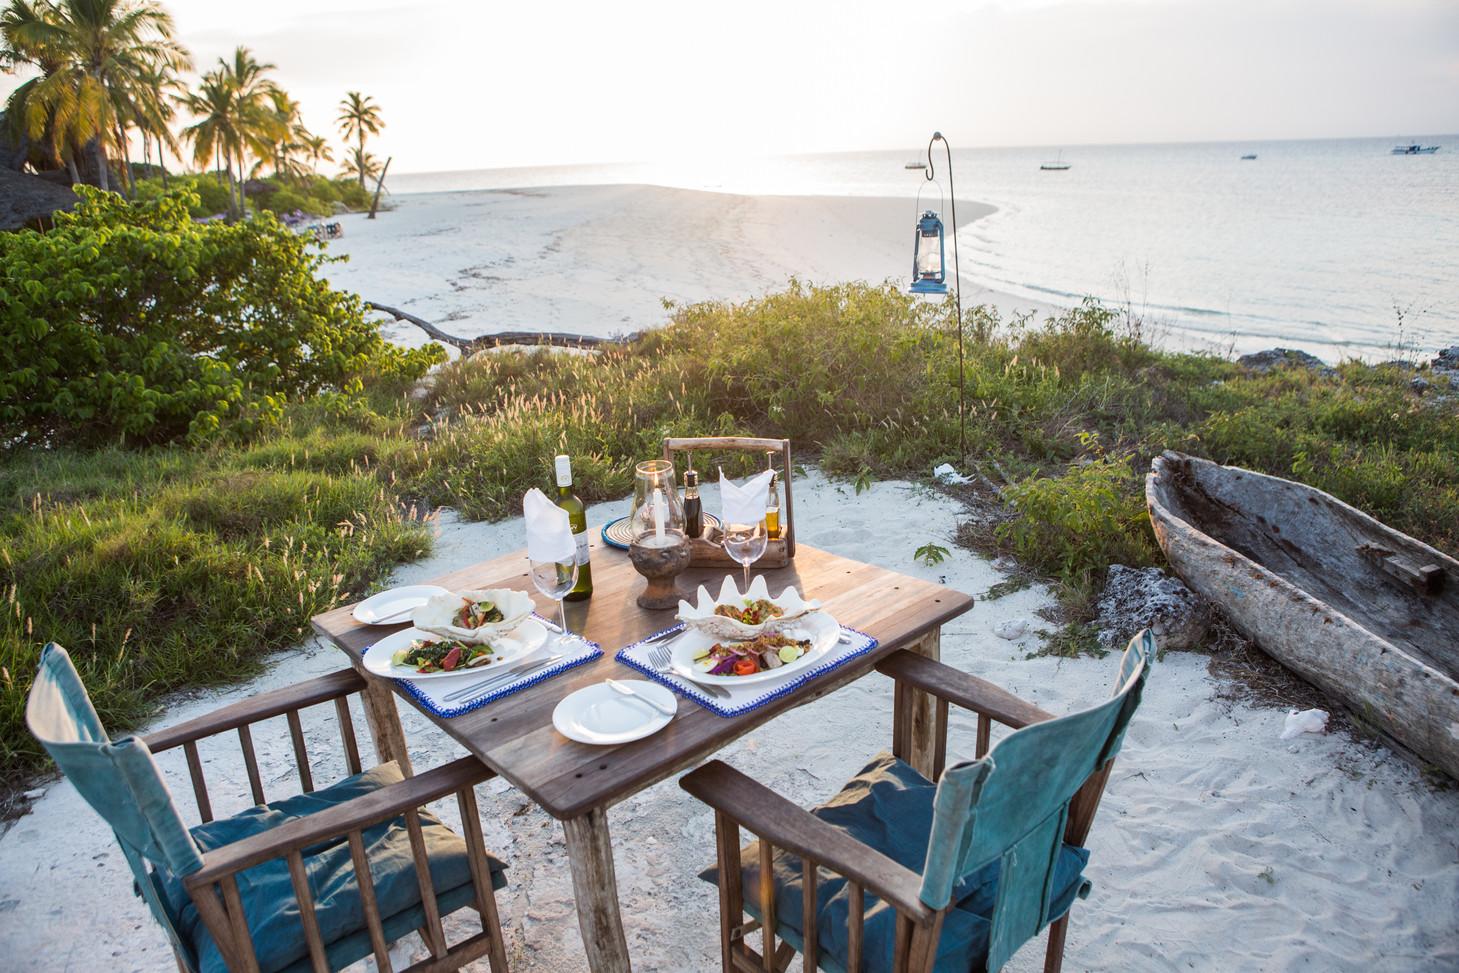 Tanzania Fanjove Island Dining table